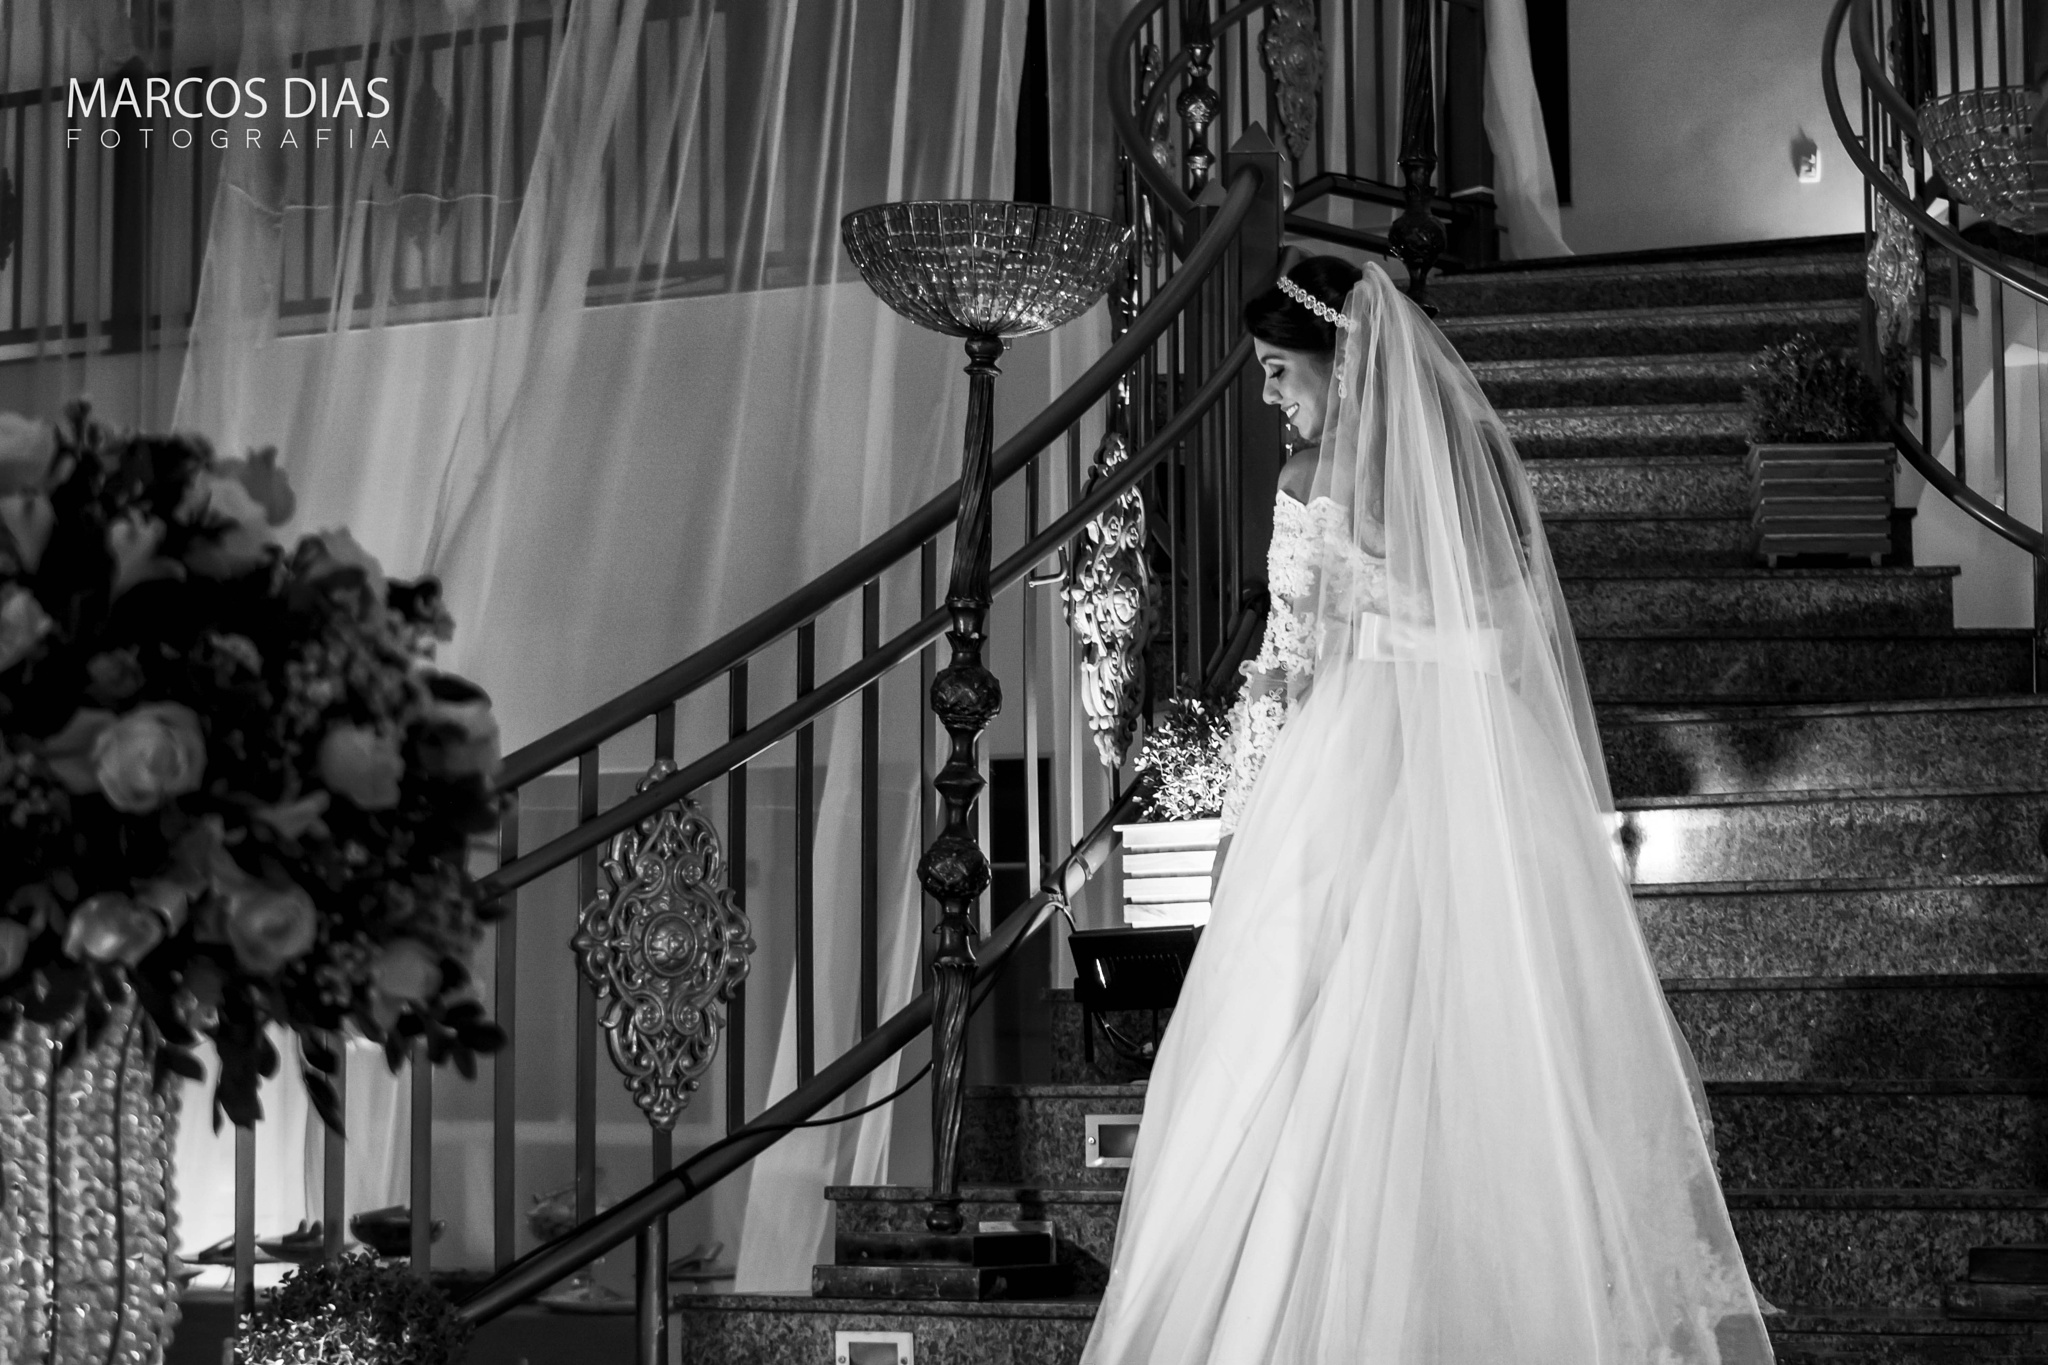 The bride by Marcos Dias